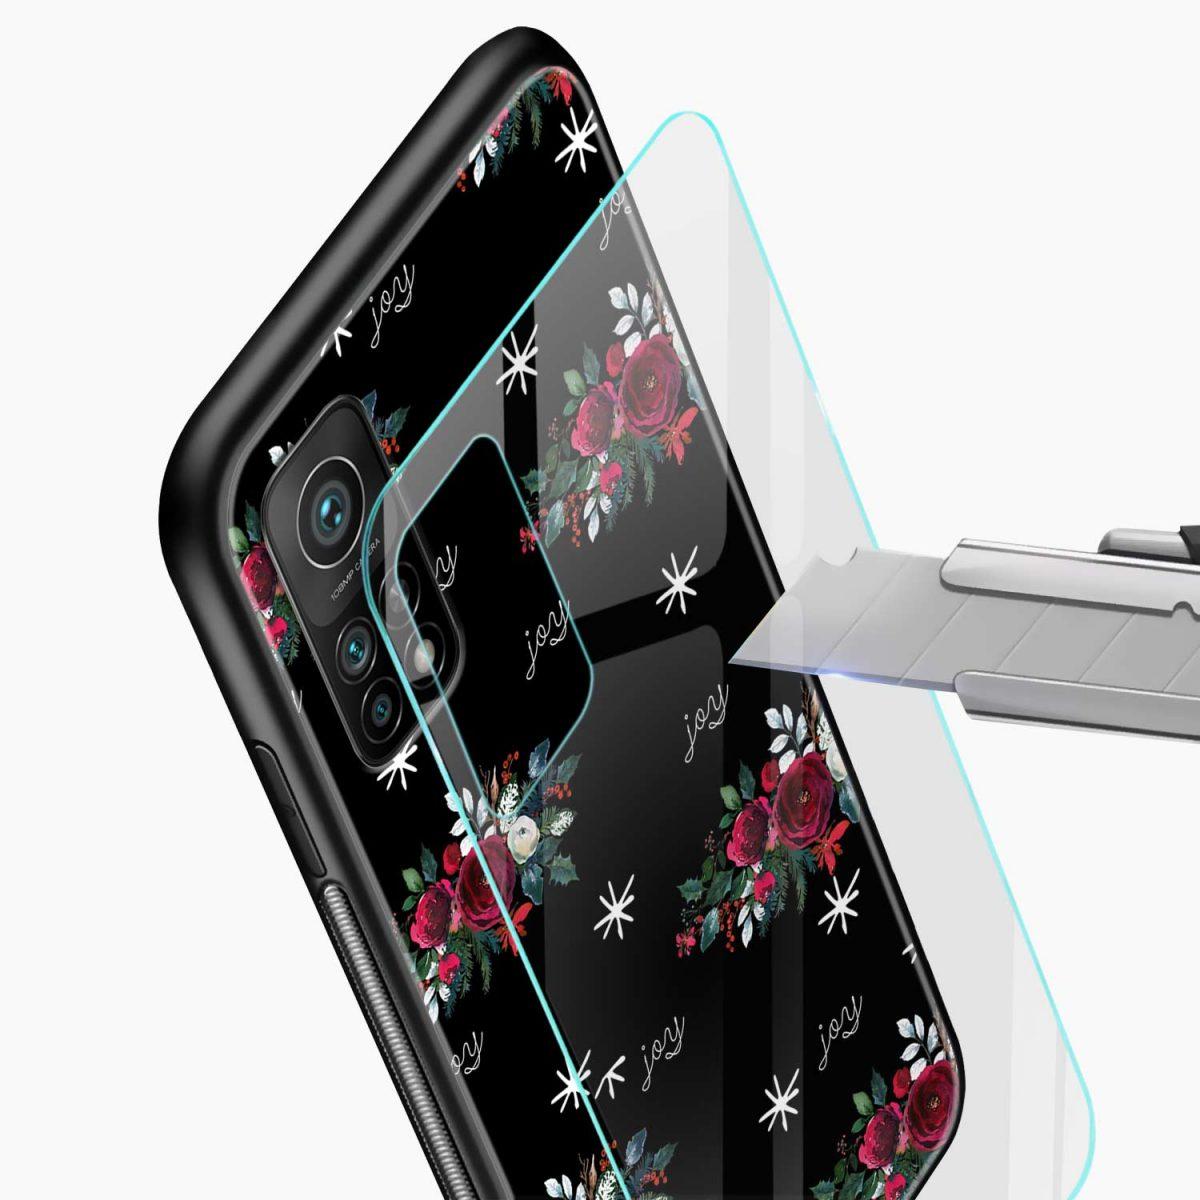 joy floral black colored xiaomi mi 10t pro back cover glass view